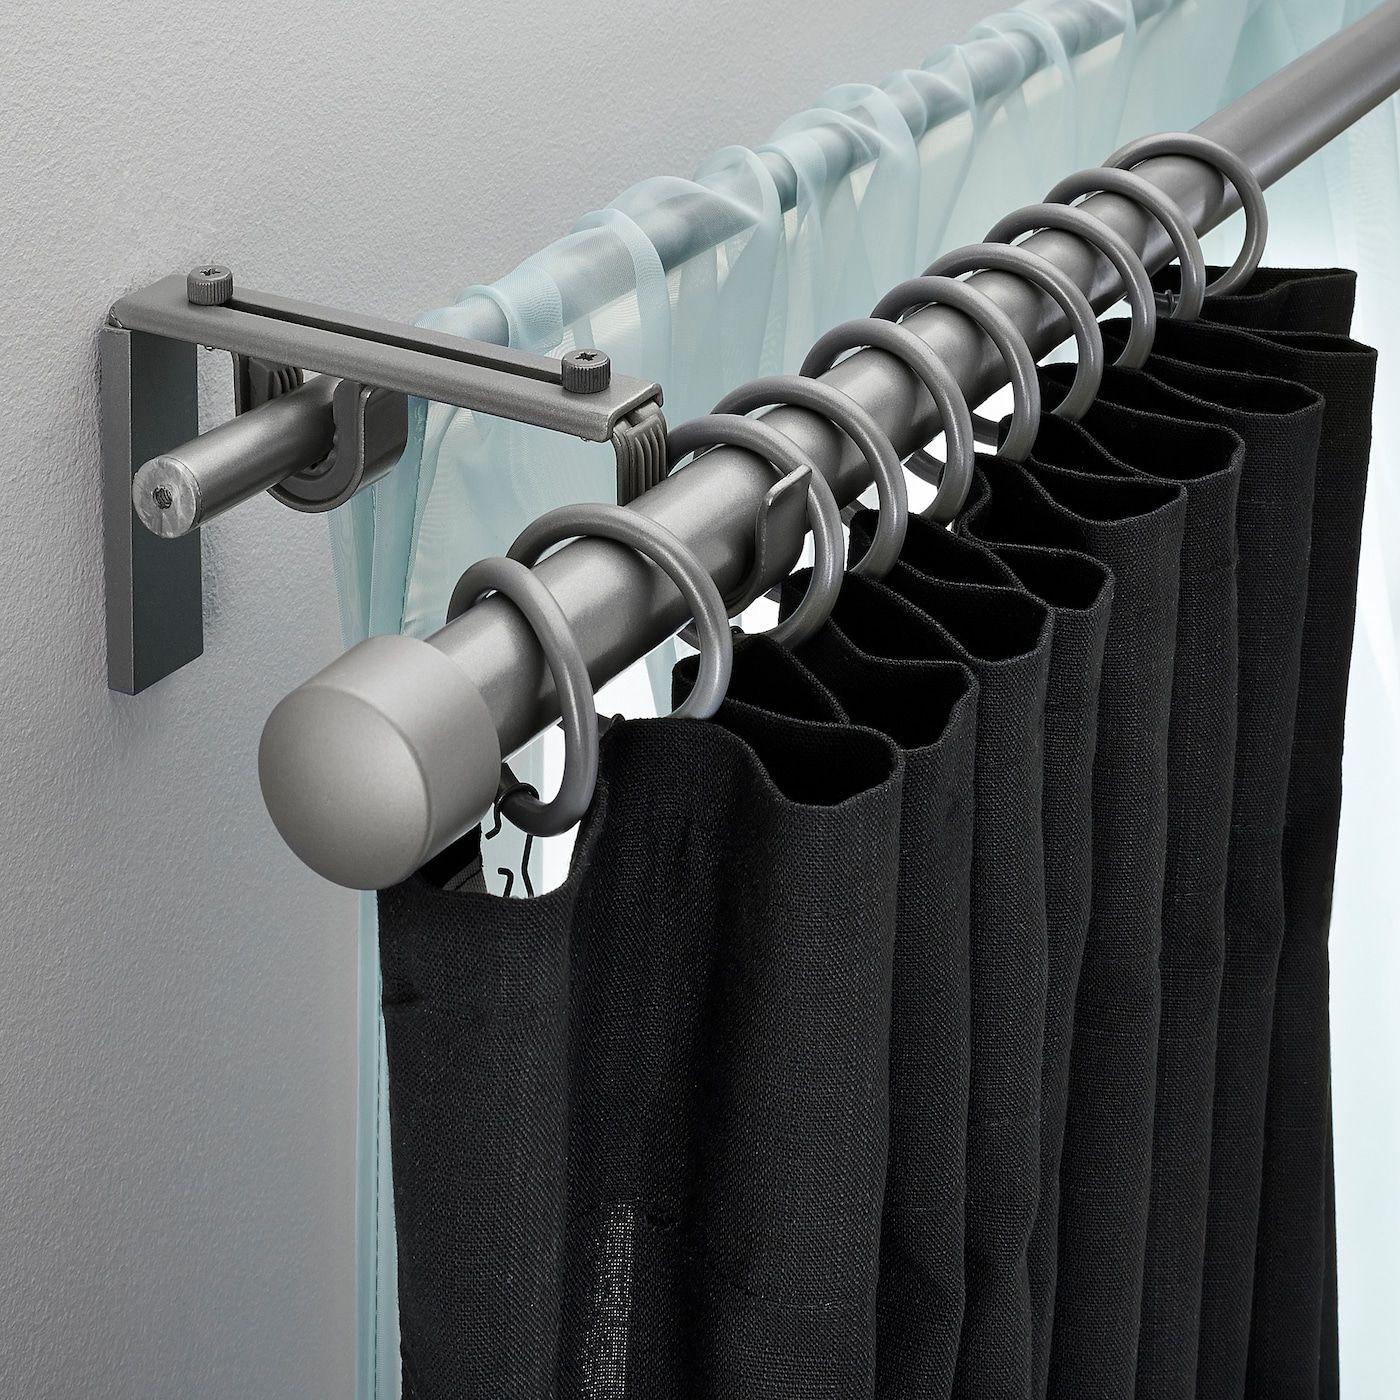 IKEA RÄCKA HUGAD Double curtain rod